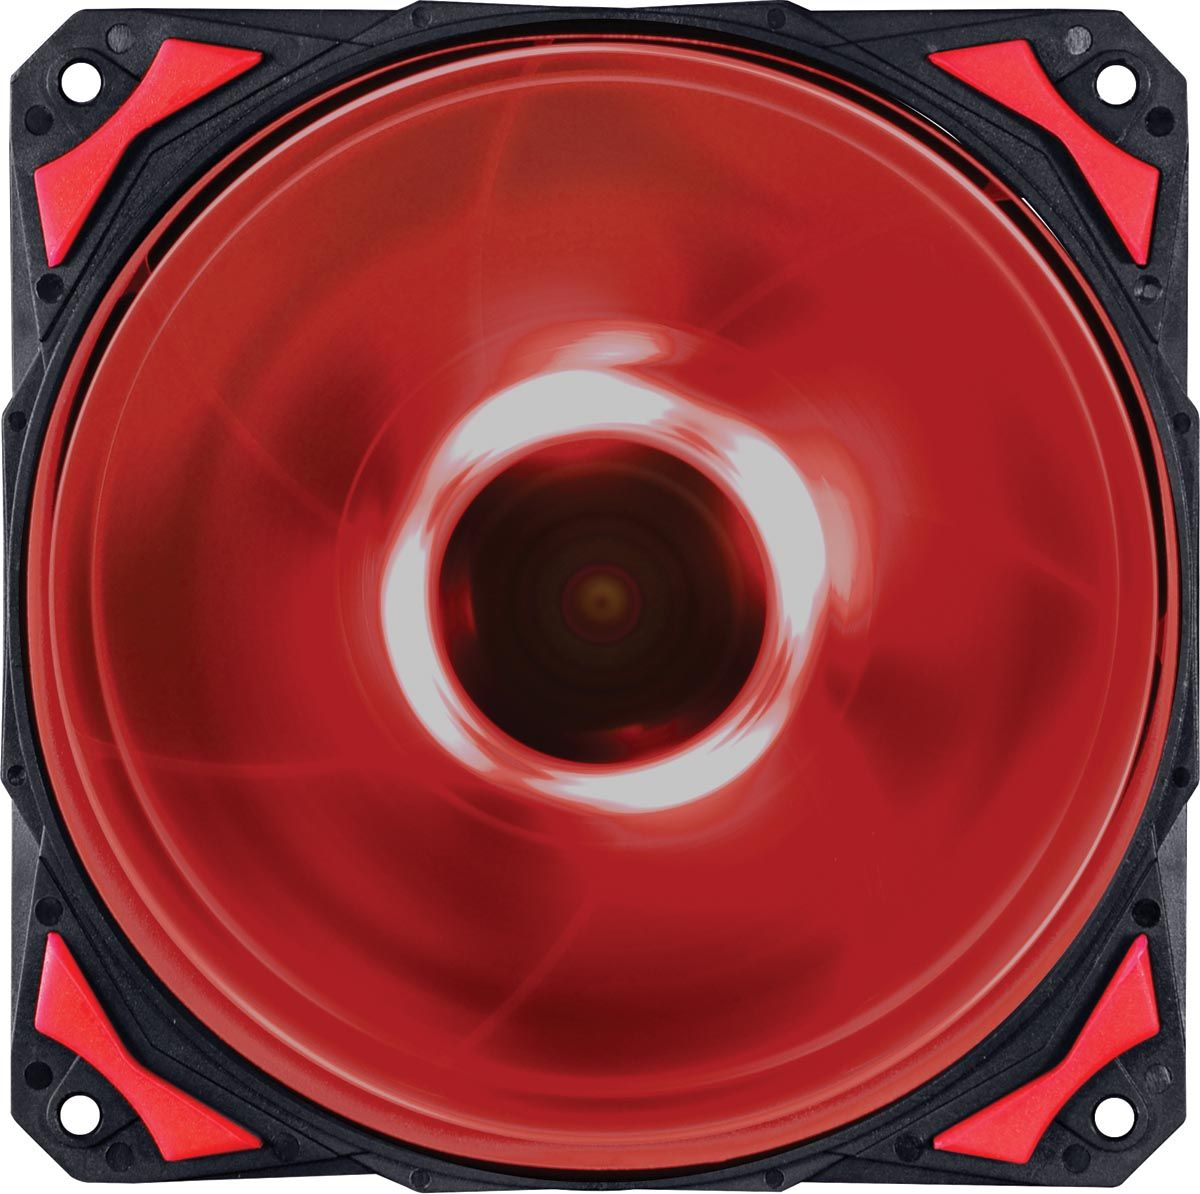 Cooler para Gabinete Fury F4 120mm LED Vermelho F4120LDVM 24034 - Pcyes